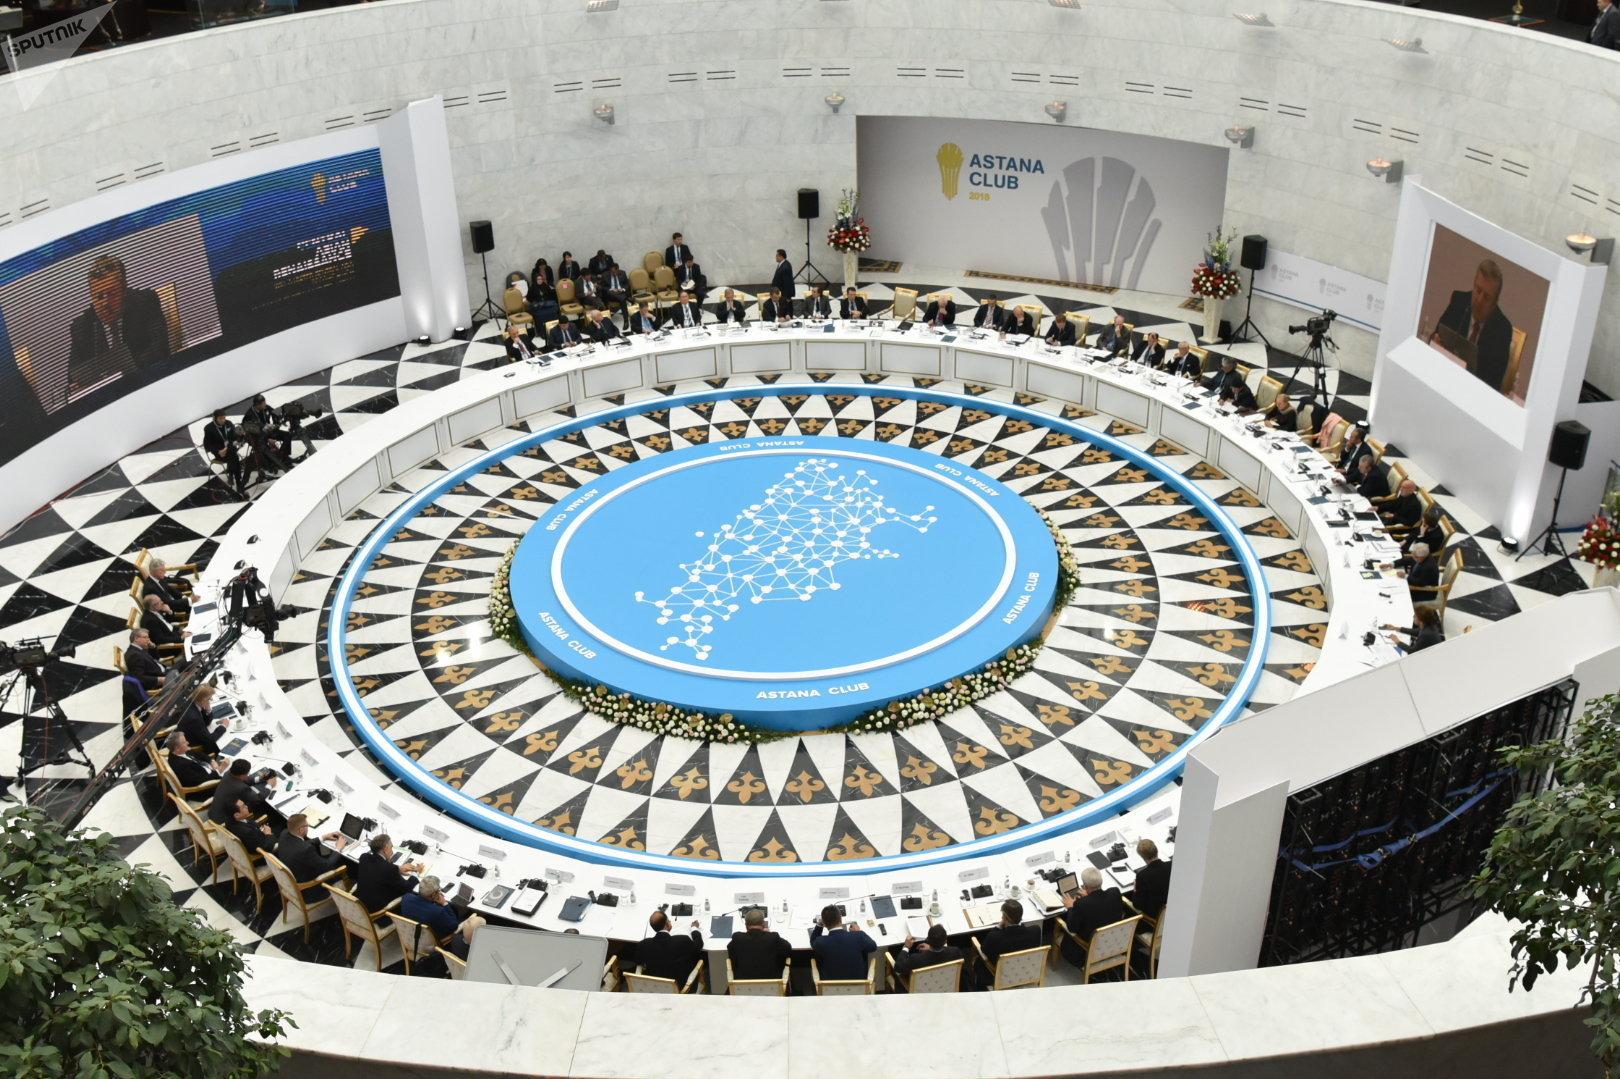 Заседание Astana Club